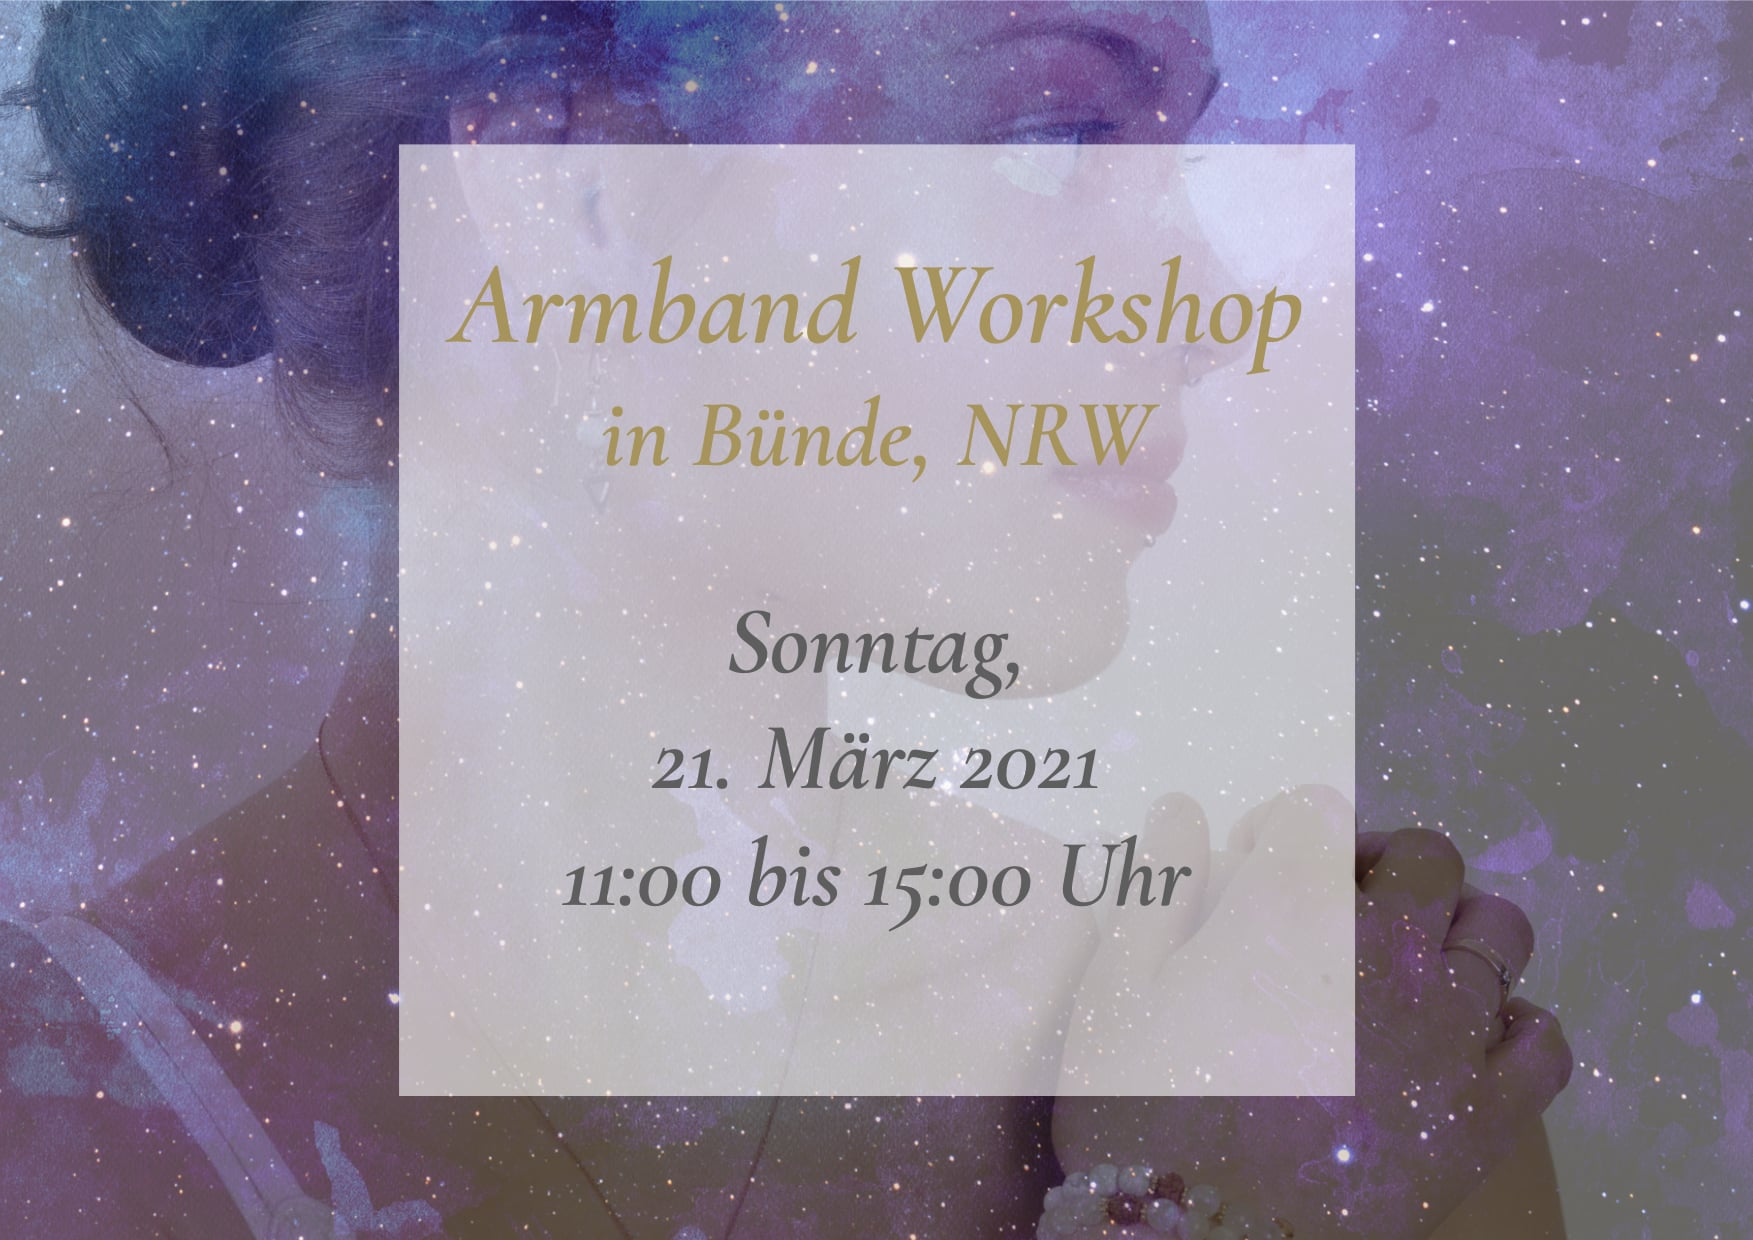 NW_Armband_WS_21_03_21_EN